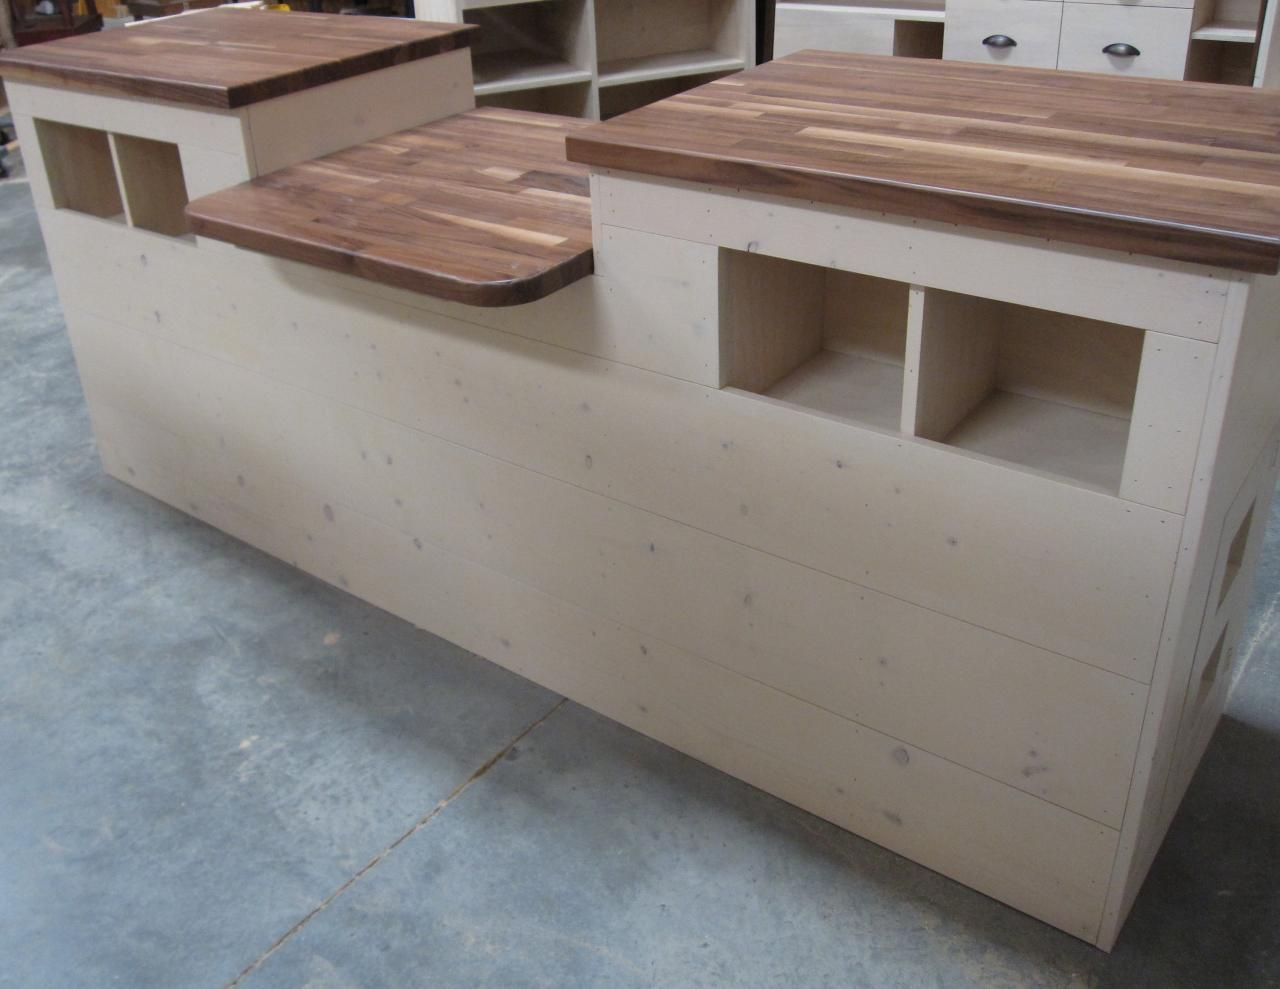 Custom Rustic Wood Cash Wrap Sales Counter Cubbies Ada Compliant